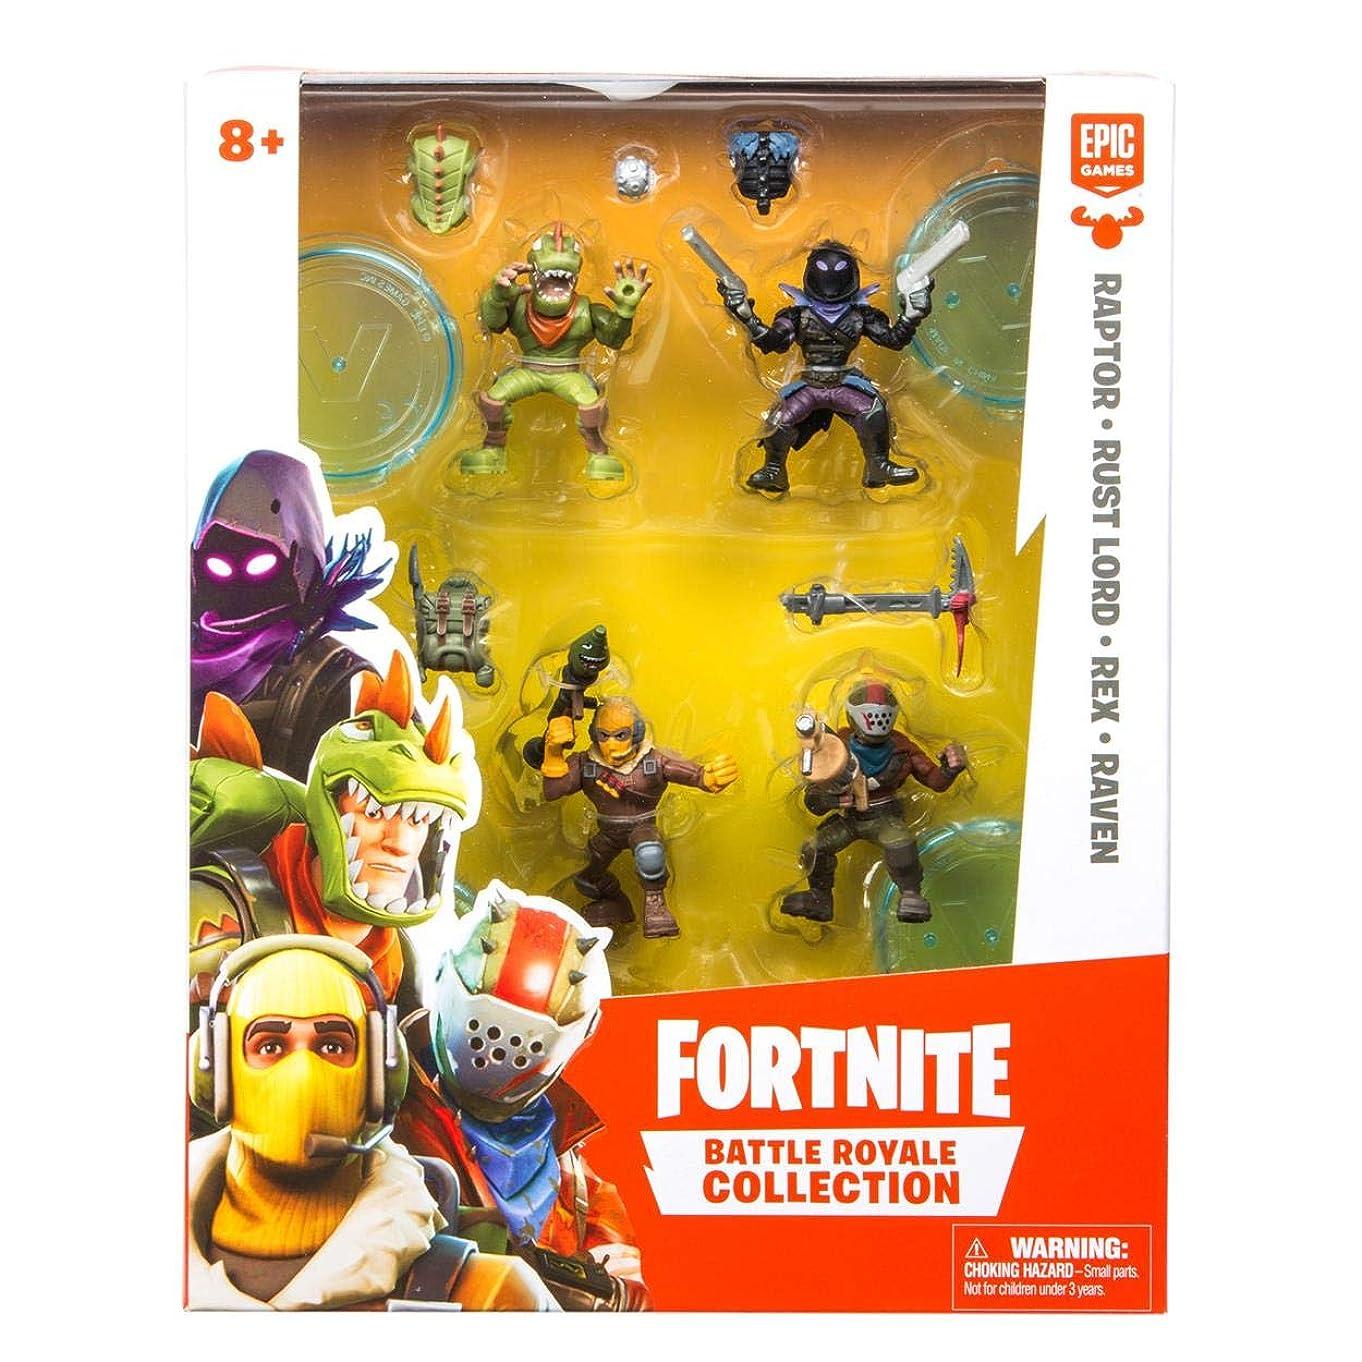 Fortnite Battle Royale Collection: 4 Action Figure Squad Pack